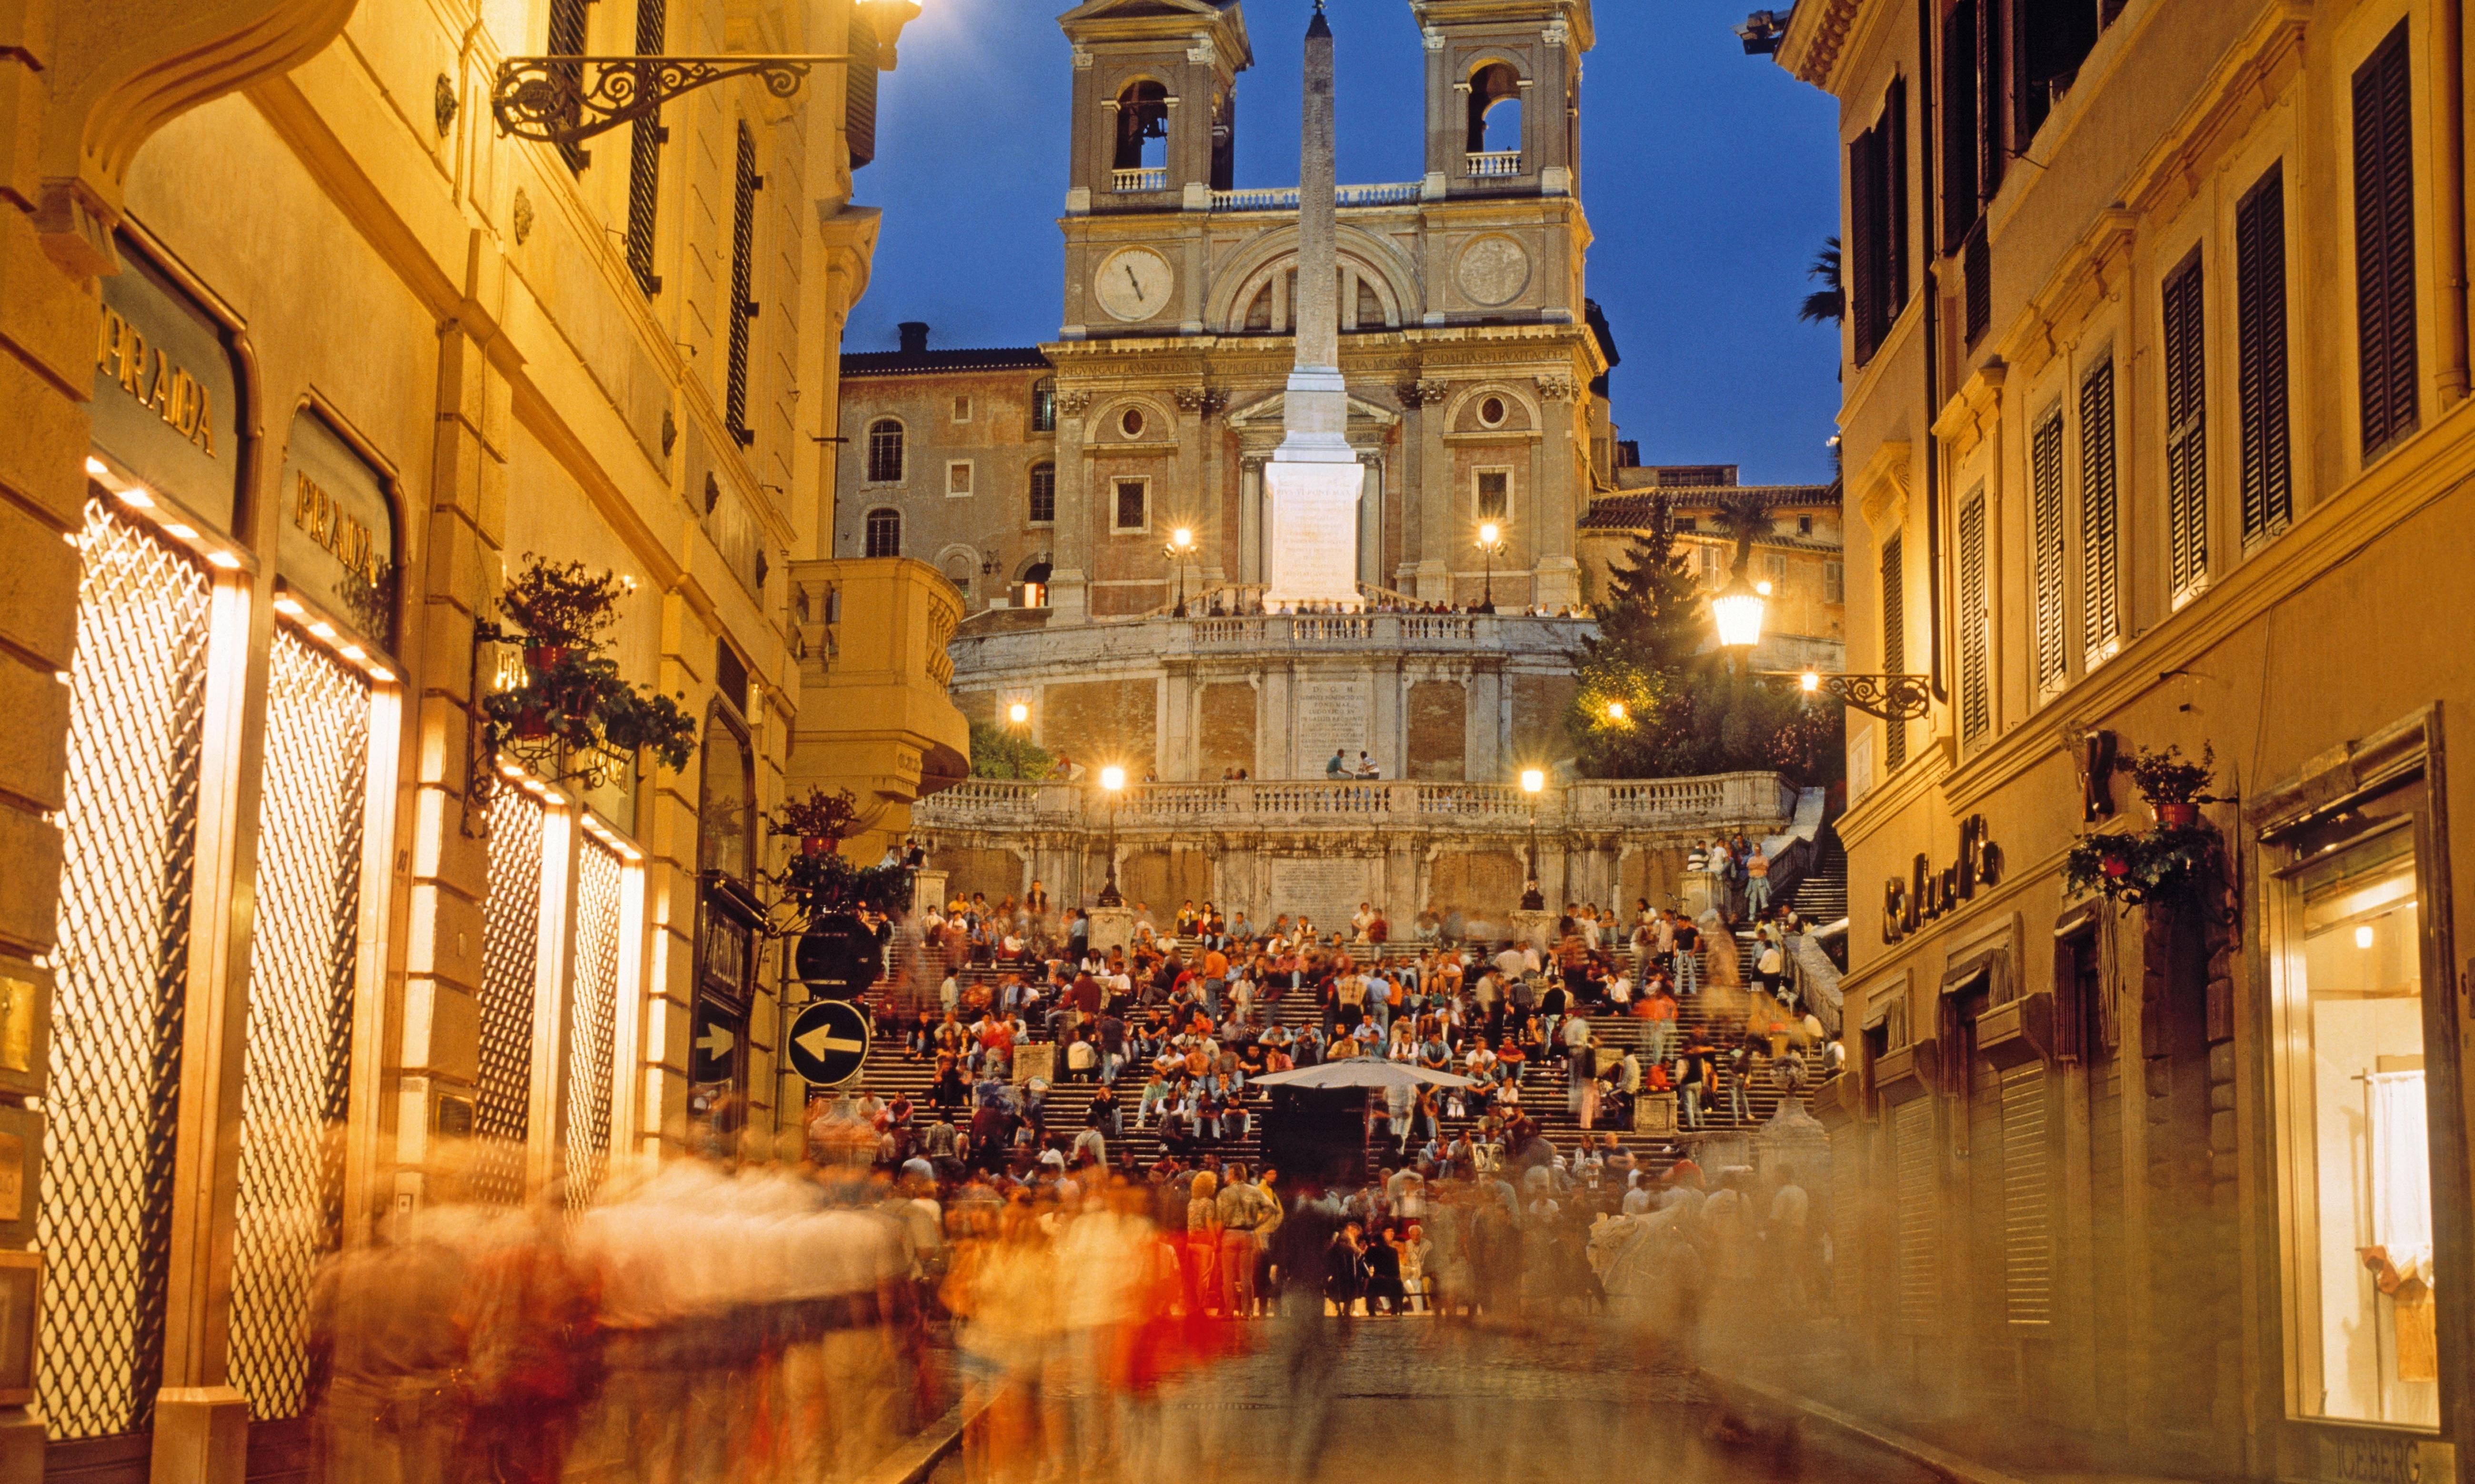 Bulgari's €1.5m restoration of Rome's Spanish Steps hit by delays